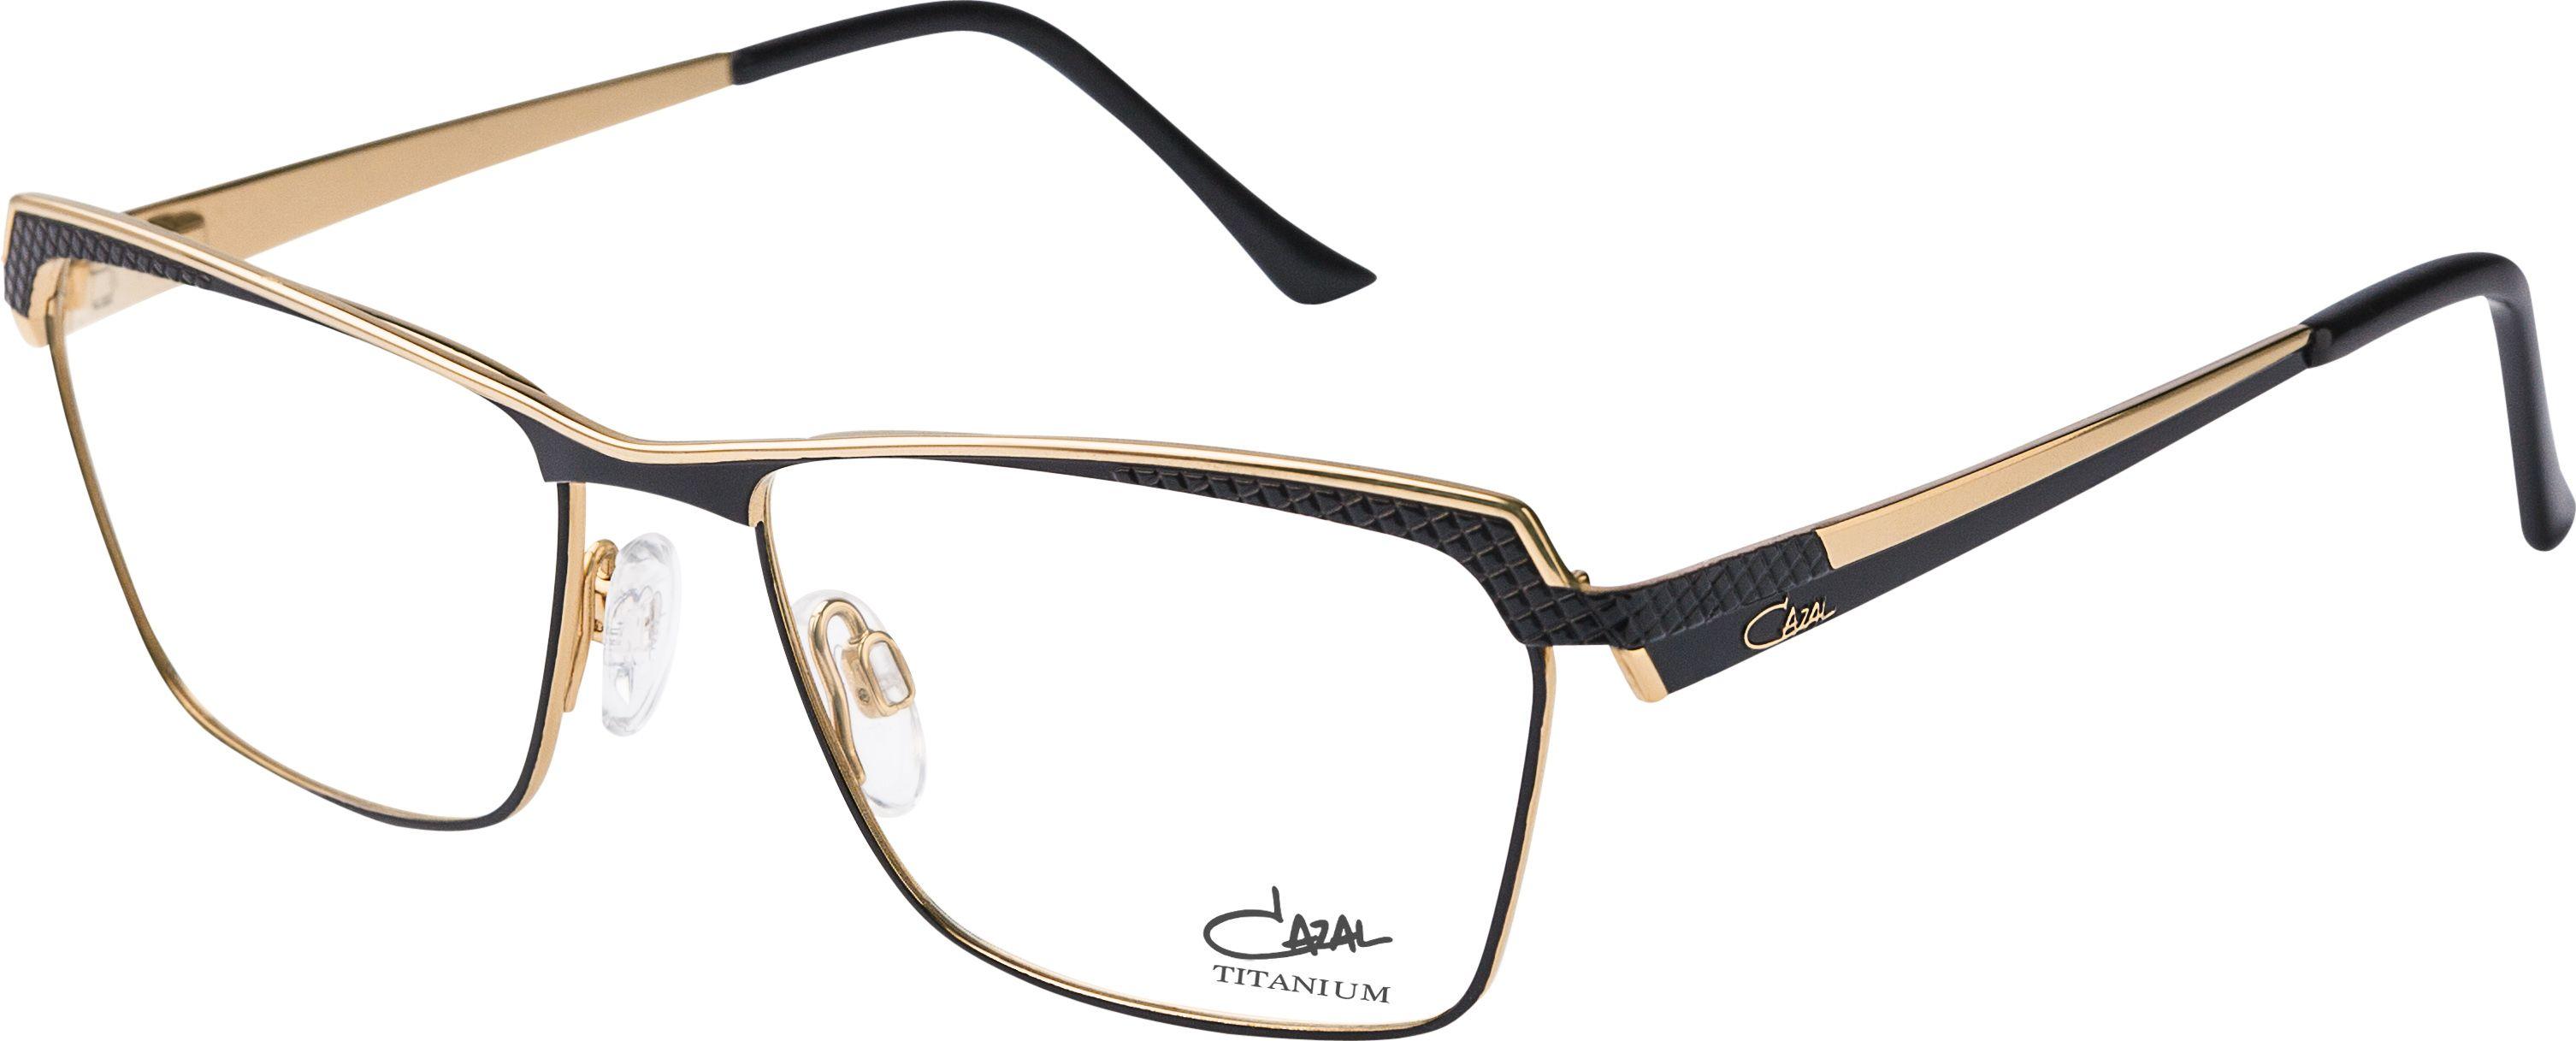 1e64262c7ef4 Cazal 1225 Eyeglass Frames - Women s